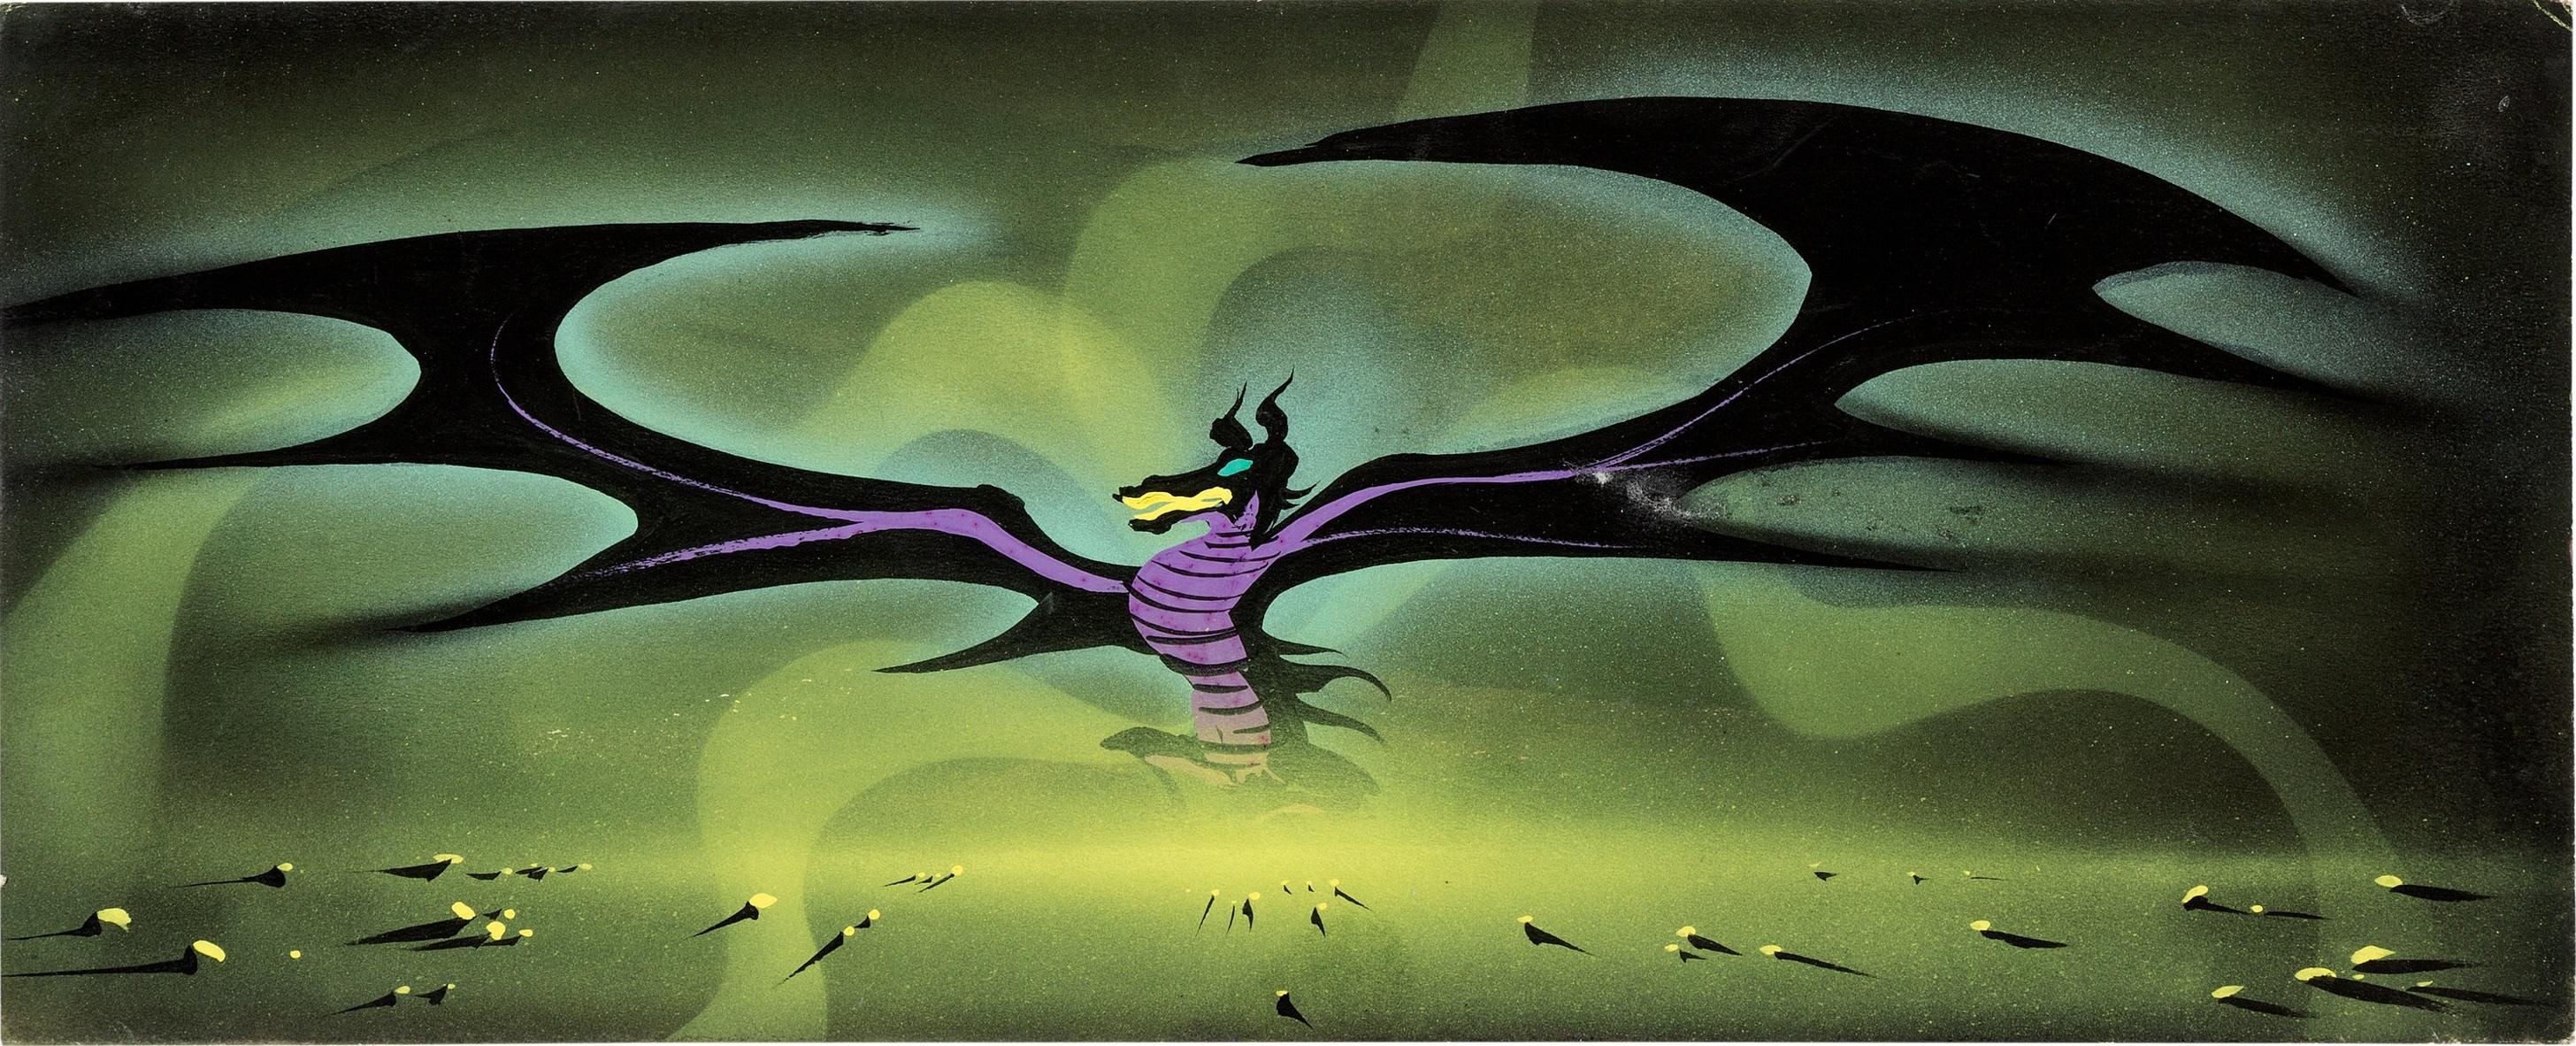 File:Maleficent's Transformation.jpg